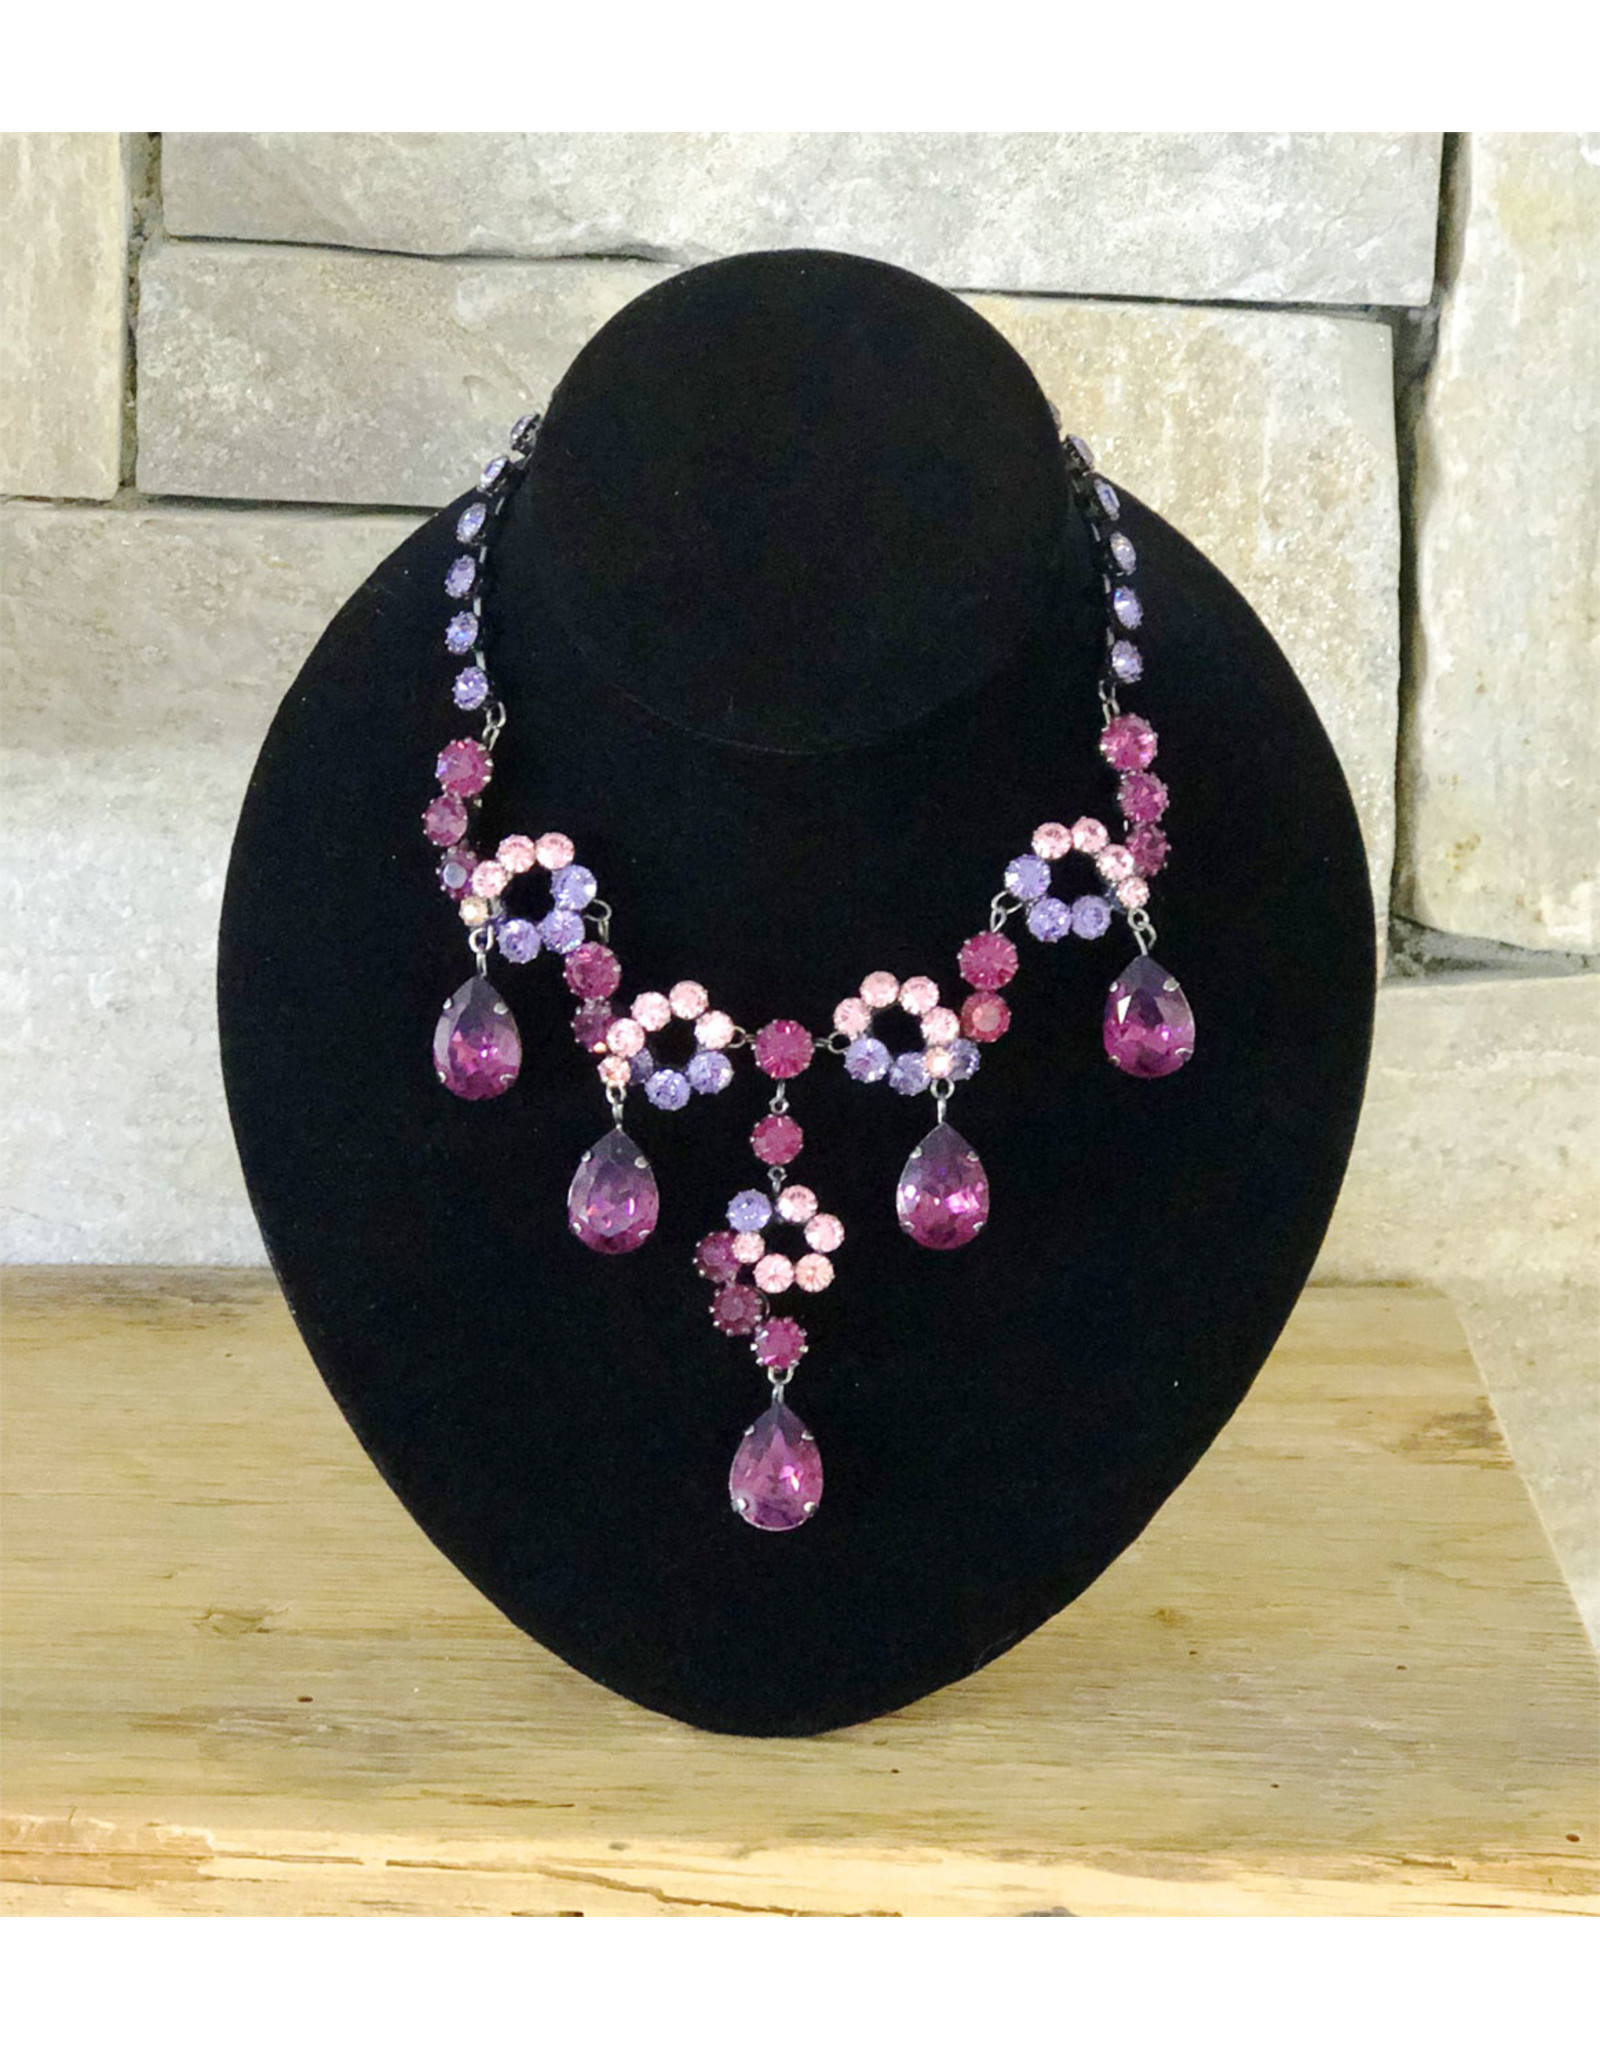 Francoise Montague Amethyst Rhinestones Necklace